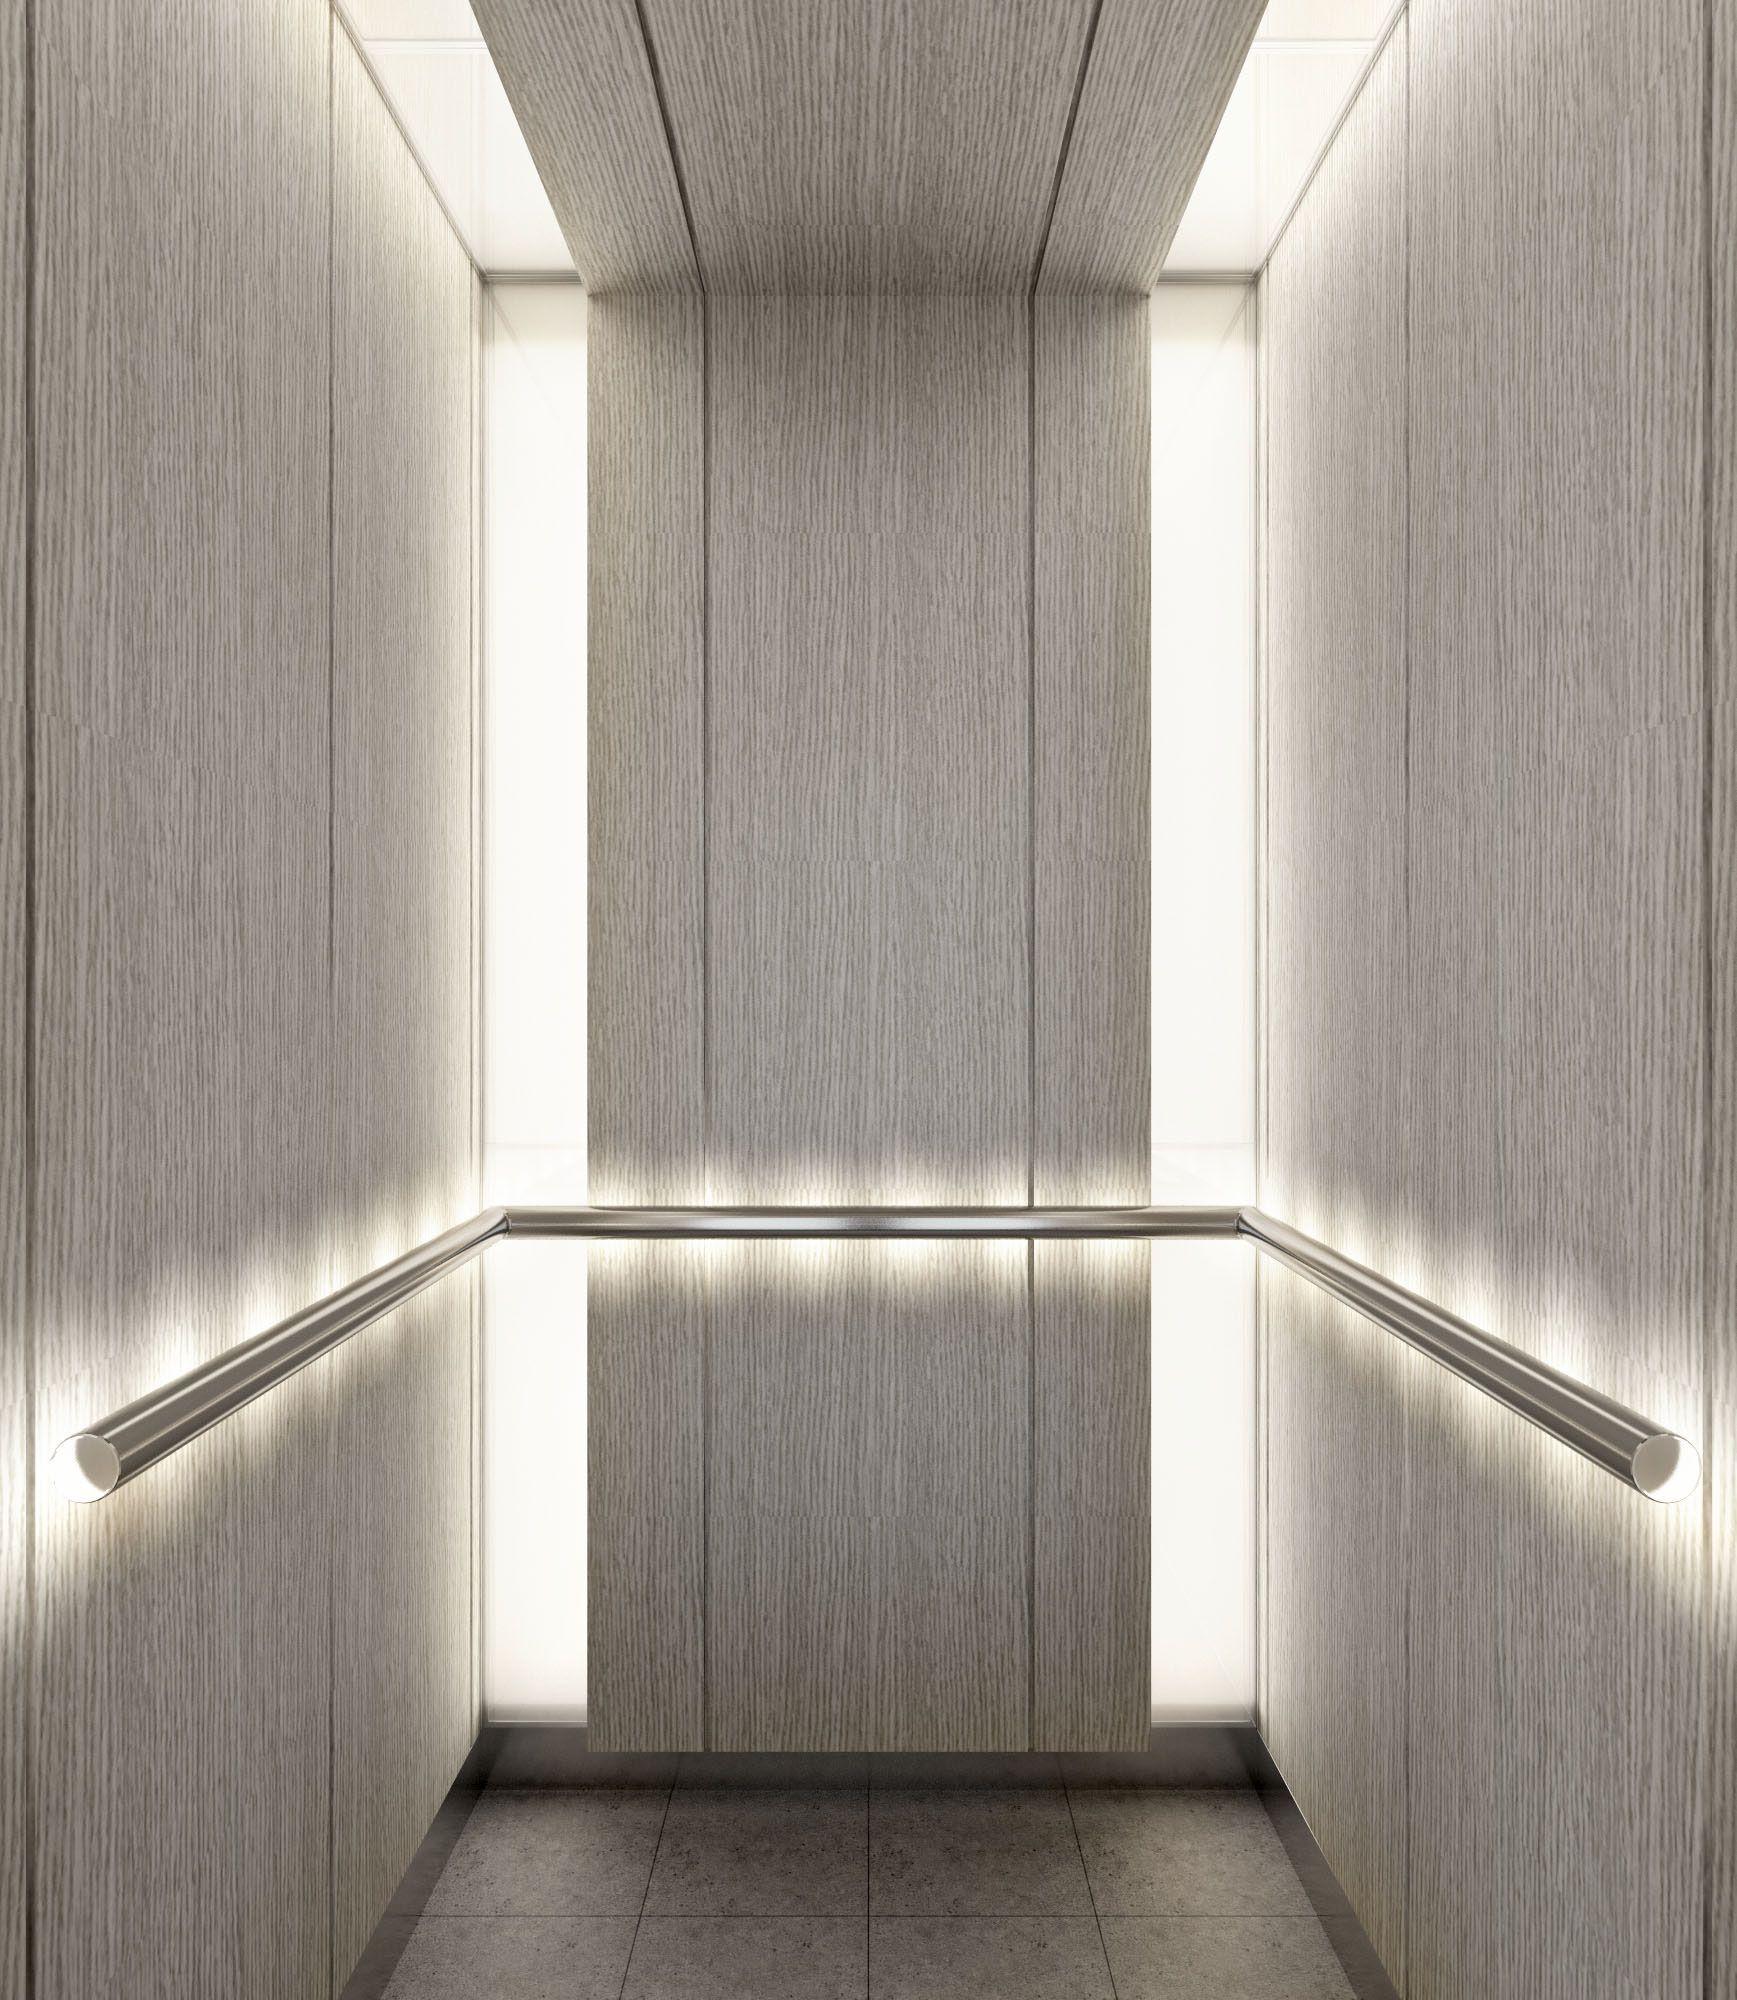 Elevator Lobby And Interior Cab Interior Design Ideas Vida Moderninteriordesignideas Elevator Lobby Elevator